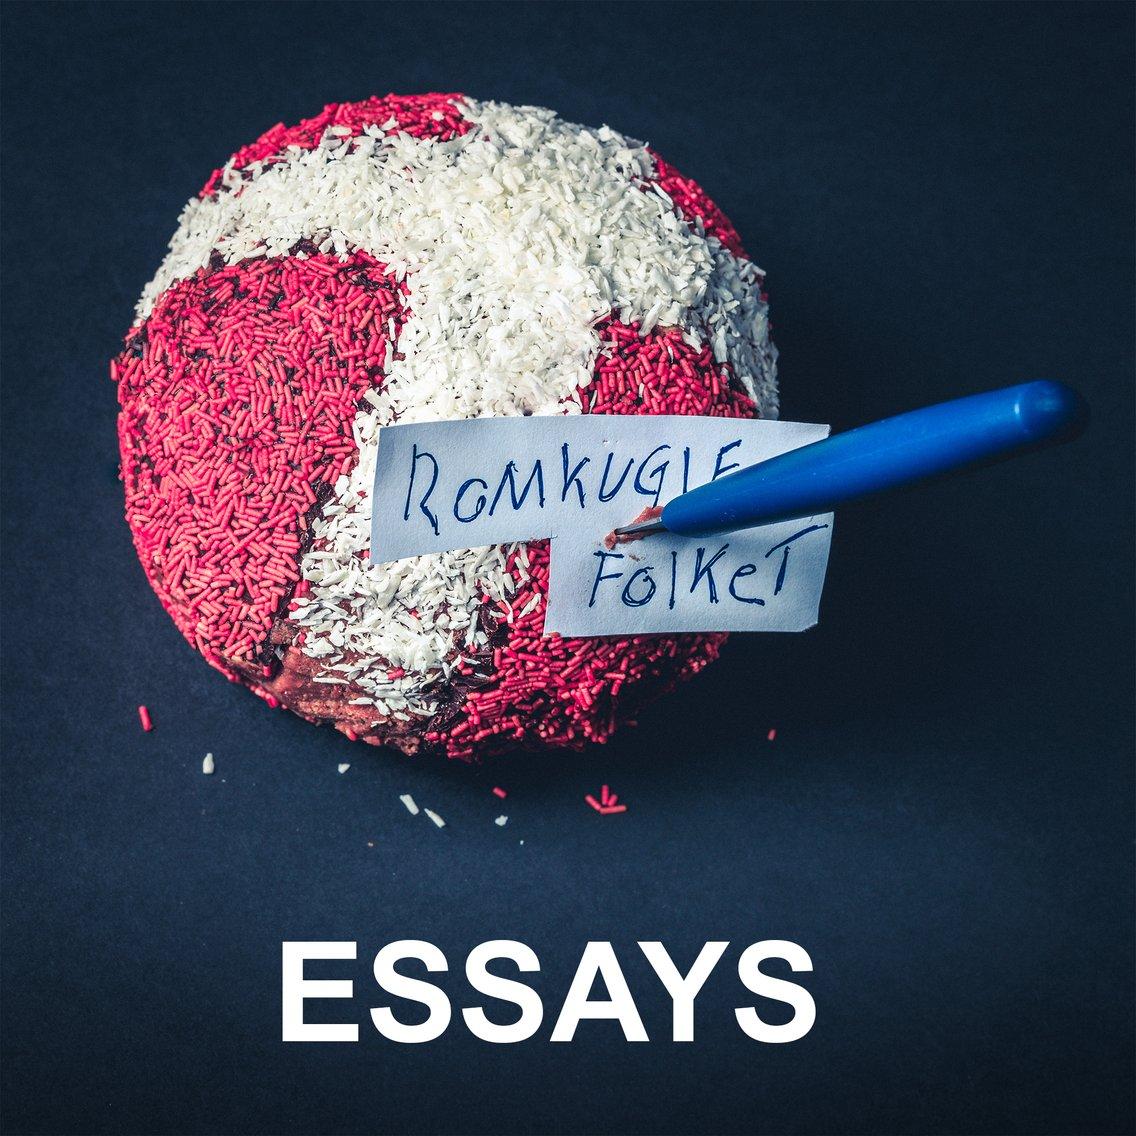 Romkugle-folket Essays - imagen de portada